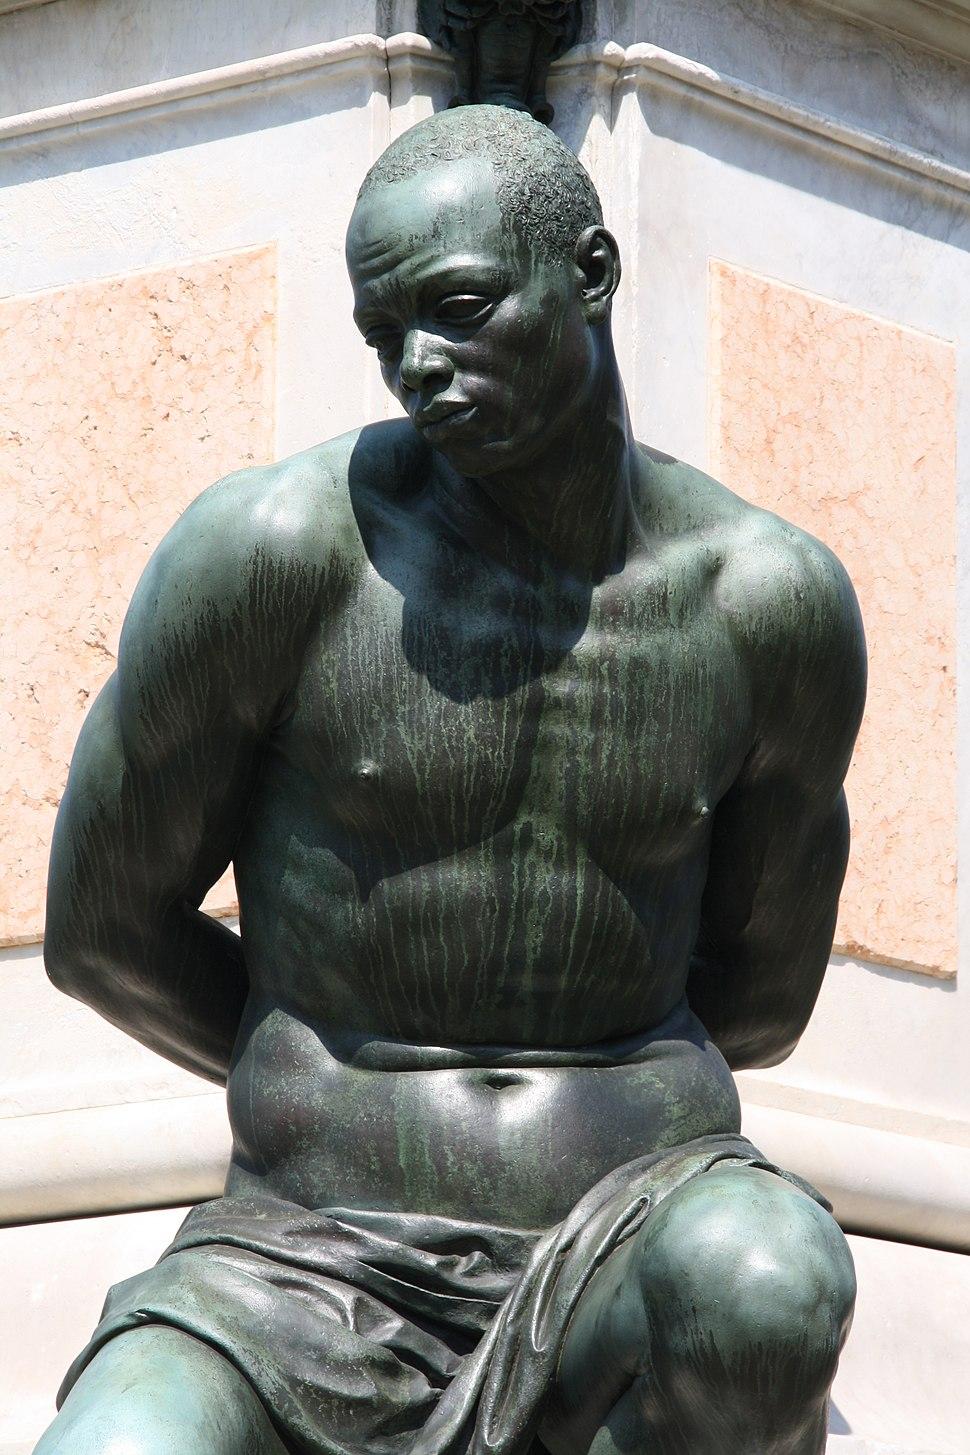 Livorno Quattro mori monument 07